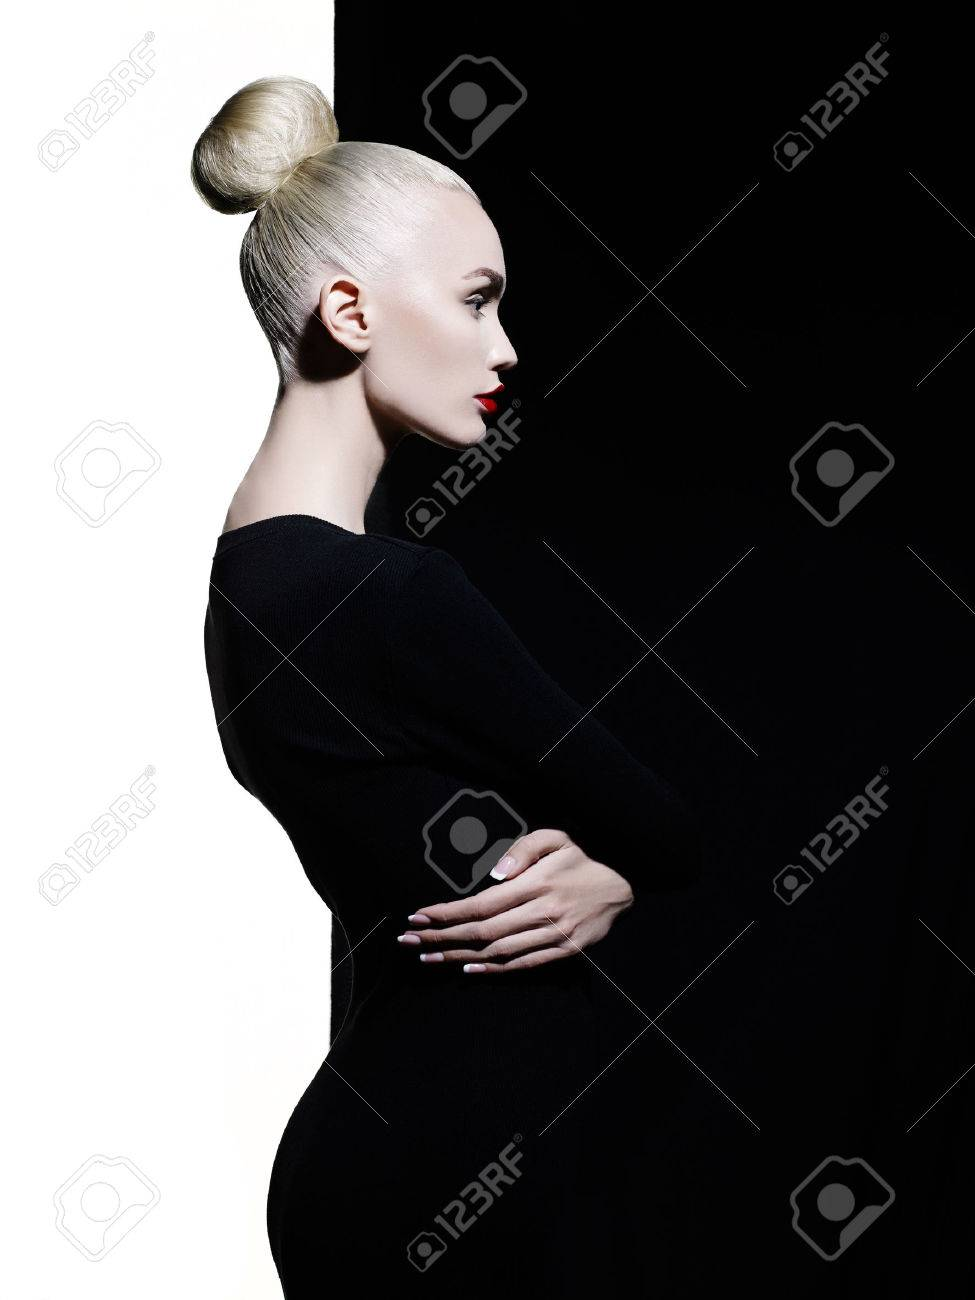 Fashion art studio portrait of elegant blode in geometric black and white background Standard-Bild - 56382188